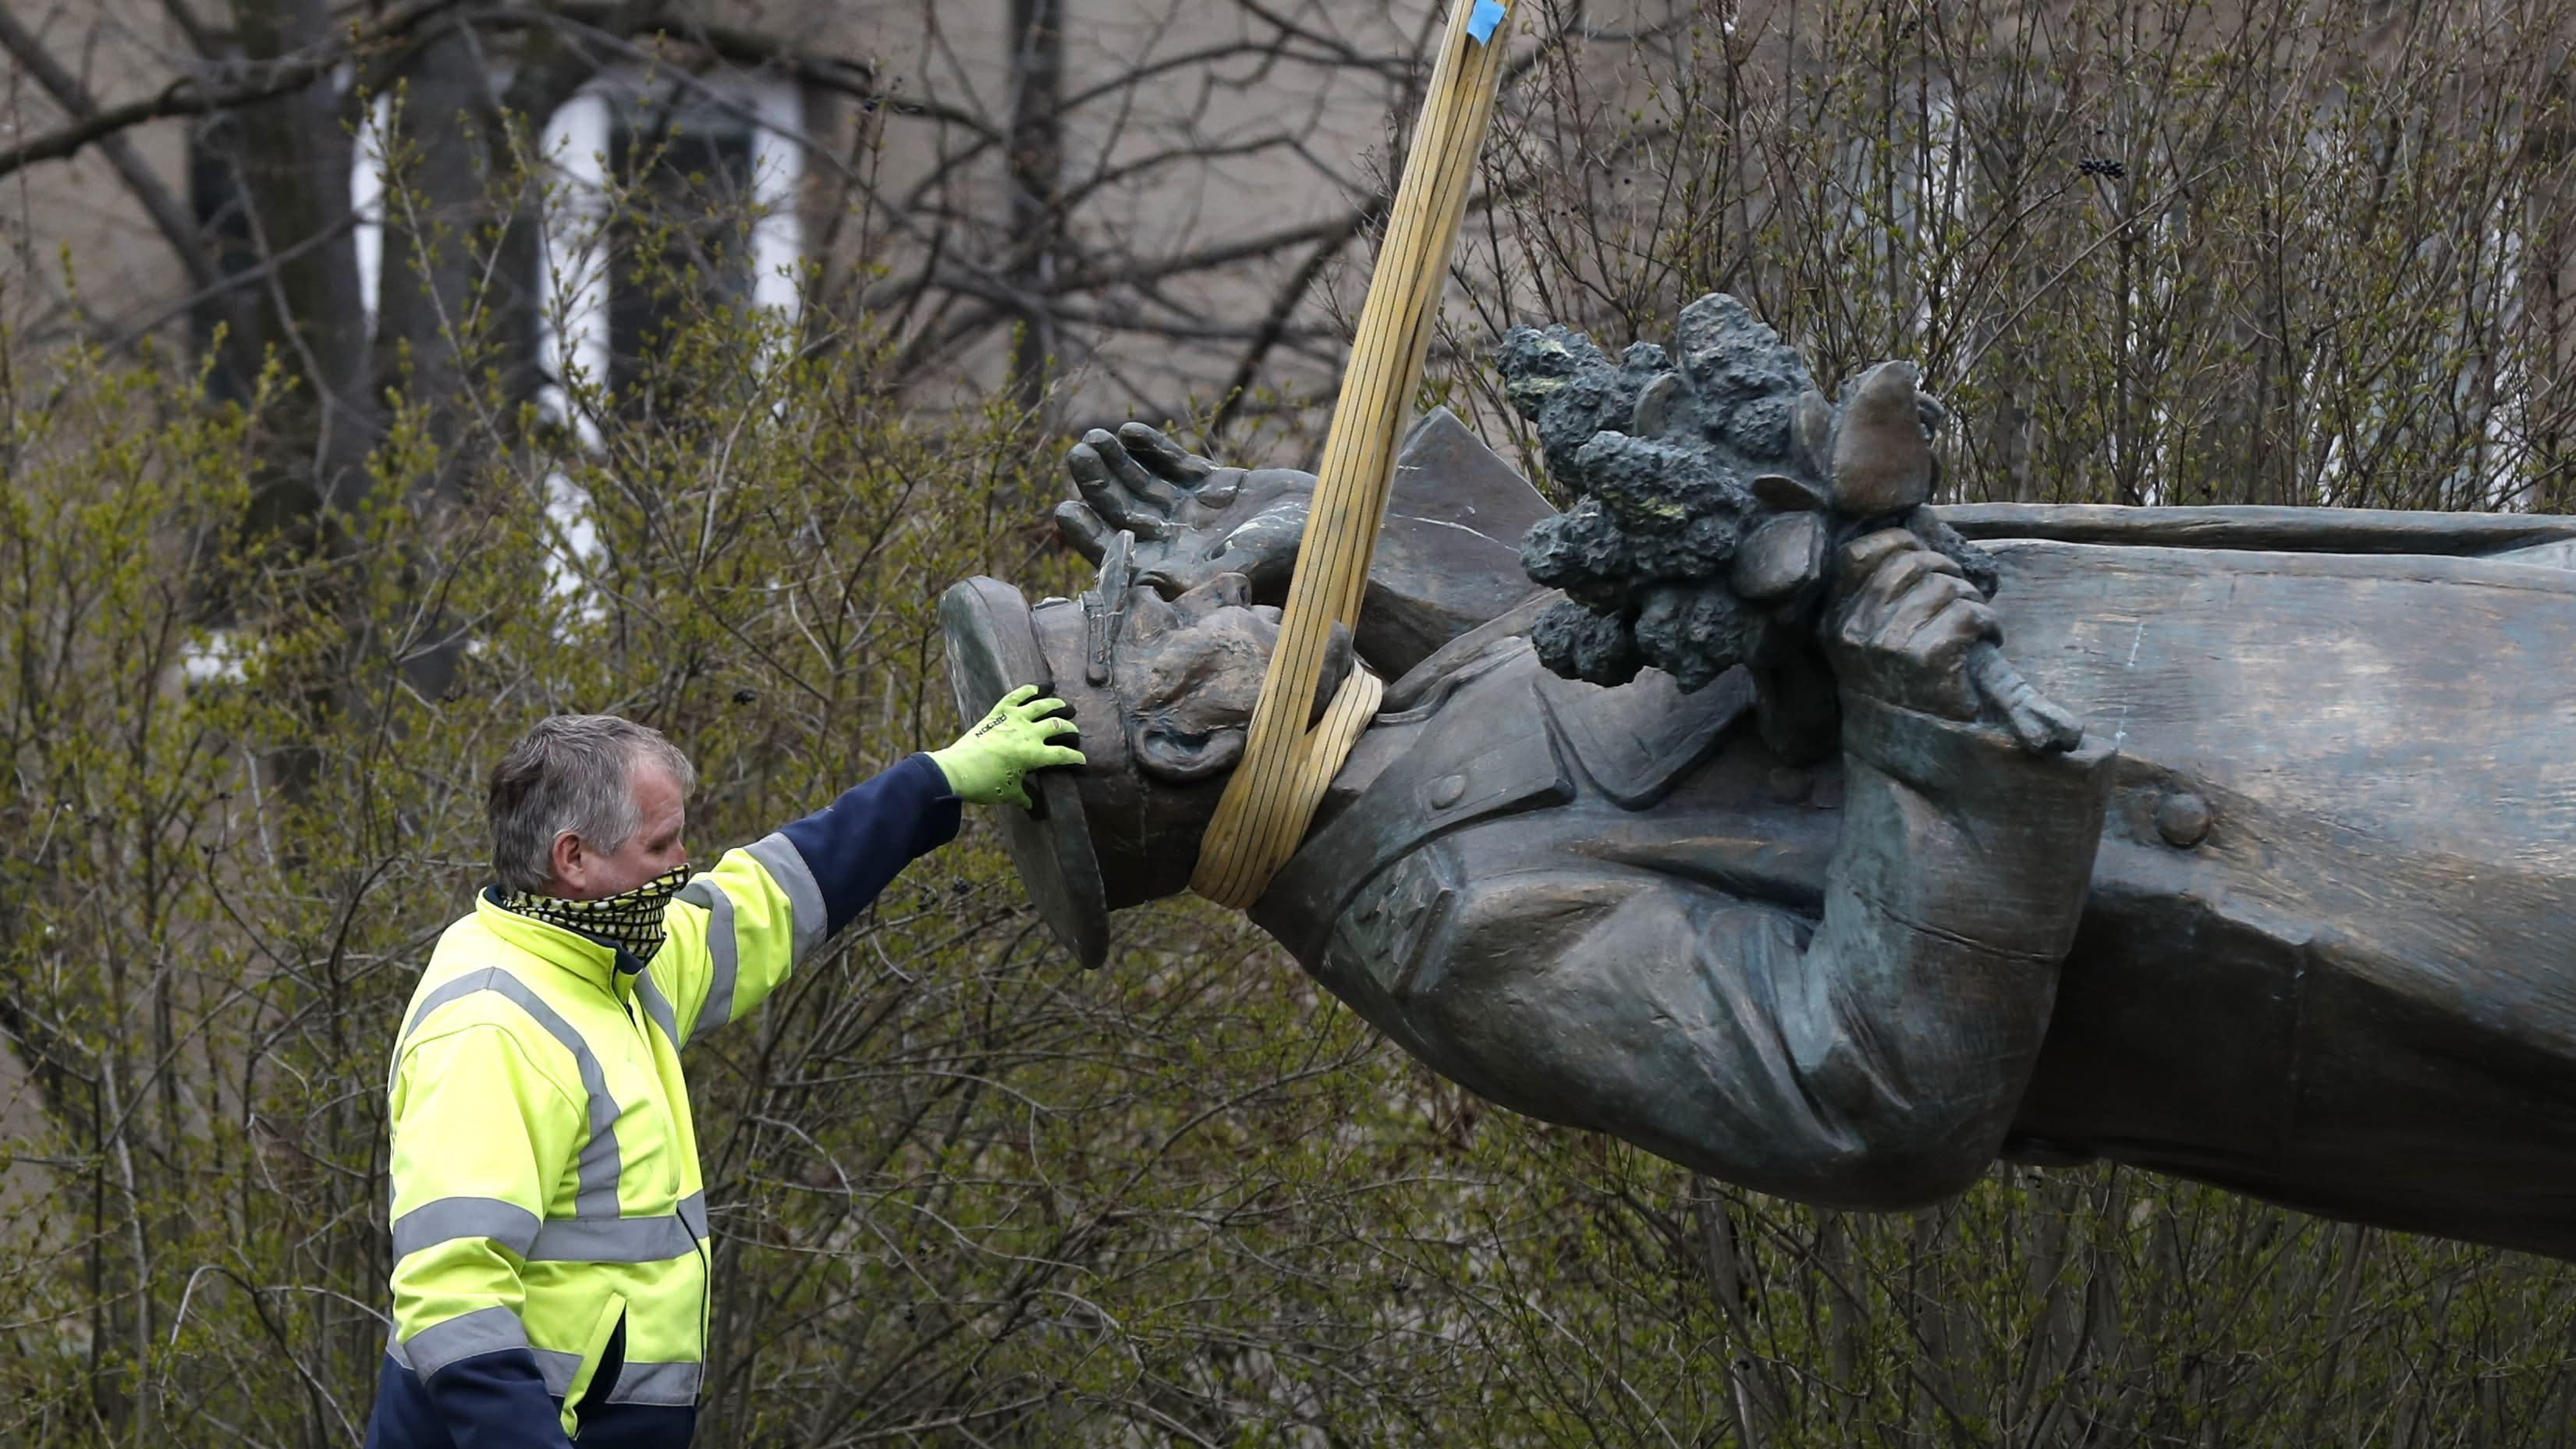 Soviet commander's statue in Prague removed despite Russian protests